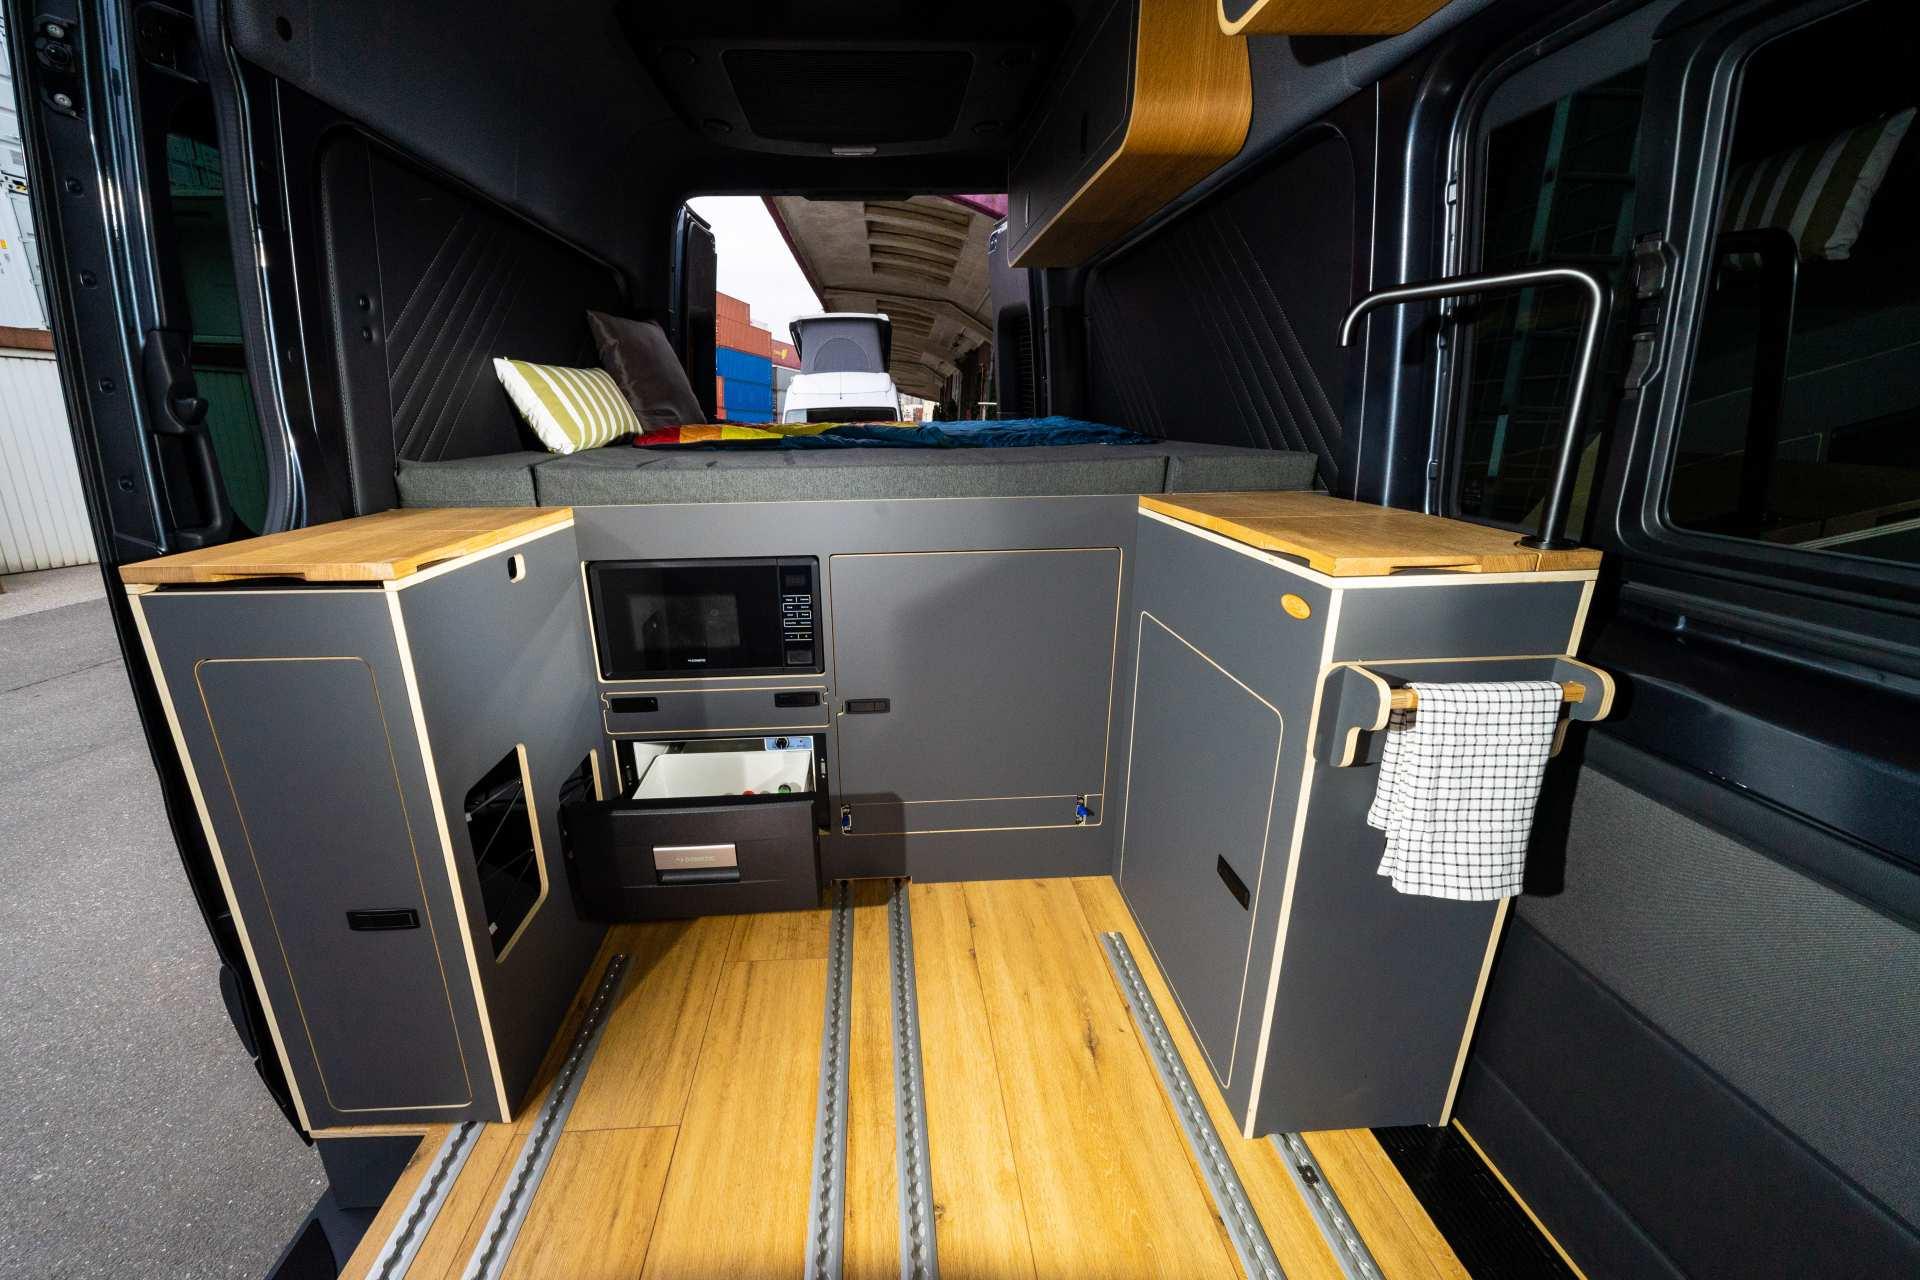 Individualausbau: Mercedes L2 H2 Mixto - 3